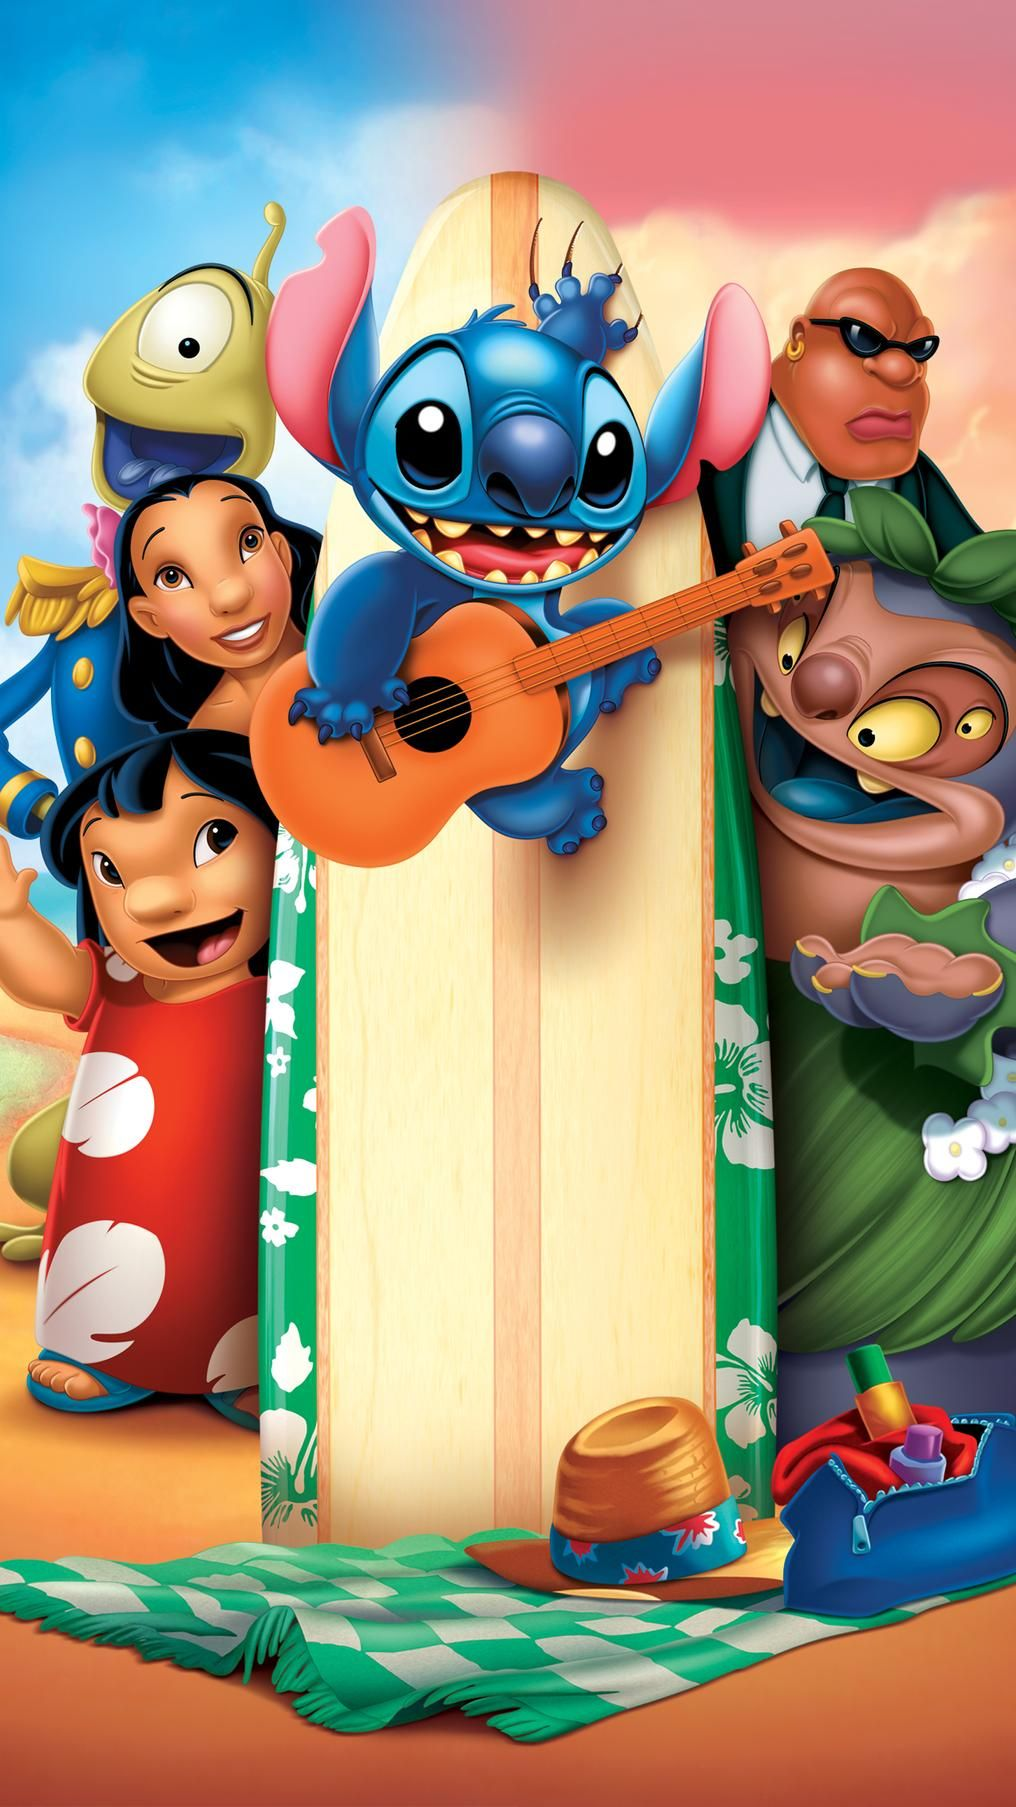 Lilo Stitch 2002 Phone Wallpaper Moviemania Disney Wallpaper Disney Characters Lilo Stitch Disney